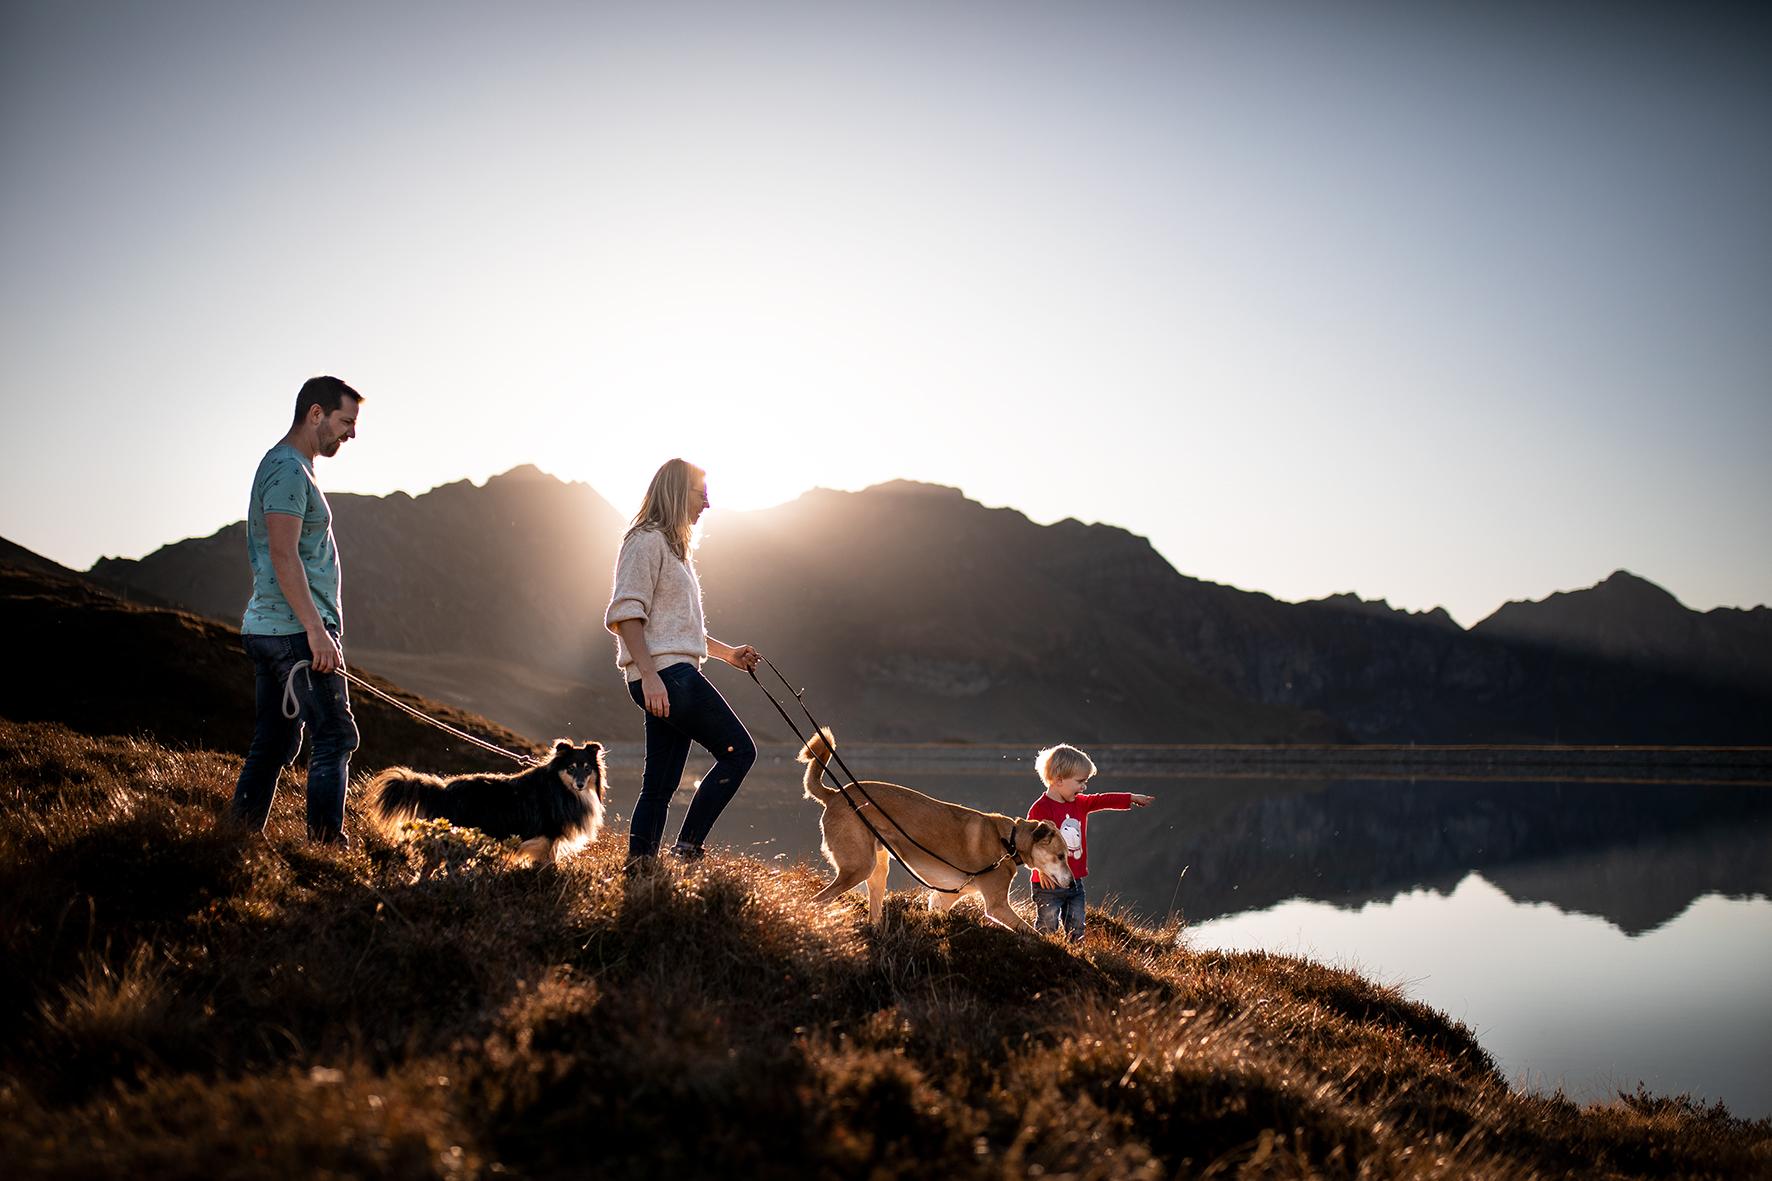 Familienshooting_Familienfotografie_Luzern_Schweiz_10